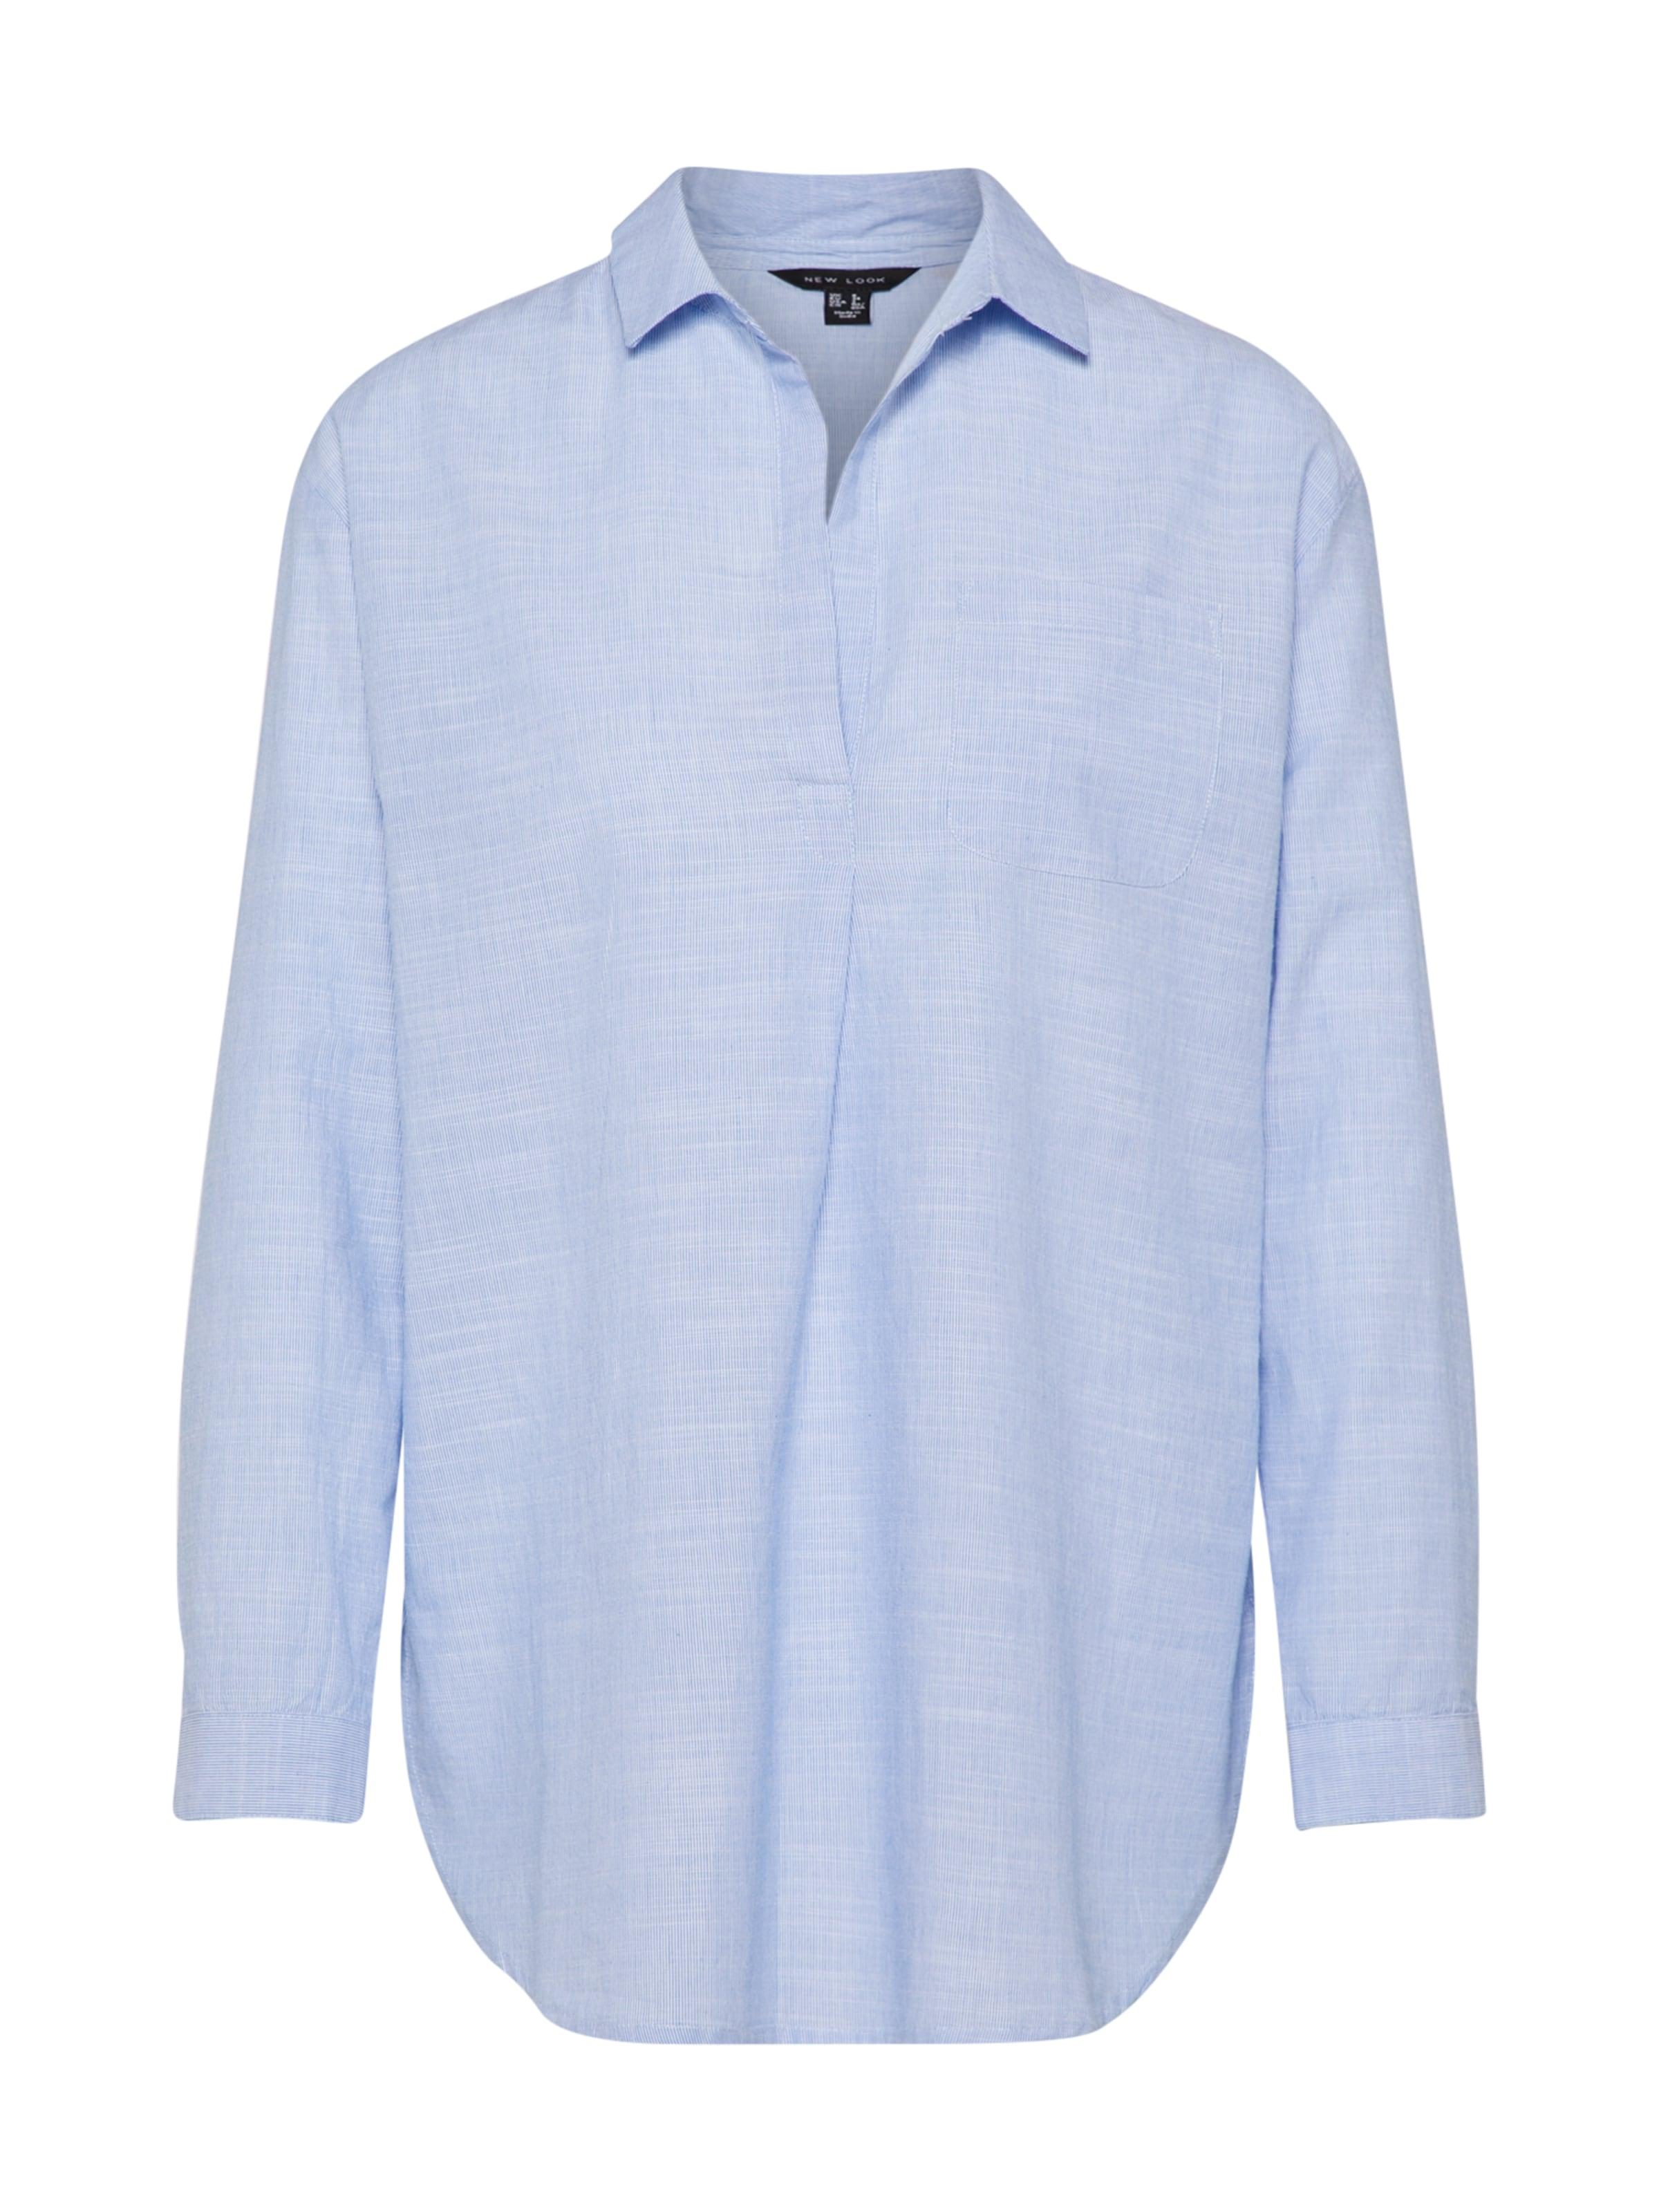 '06 head En Bleu Clair Look Chemisier 10 Ww Shirt Slub O New P264' 3AL4j5R